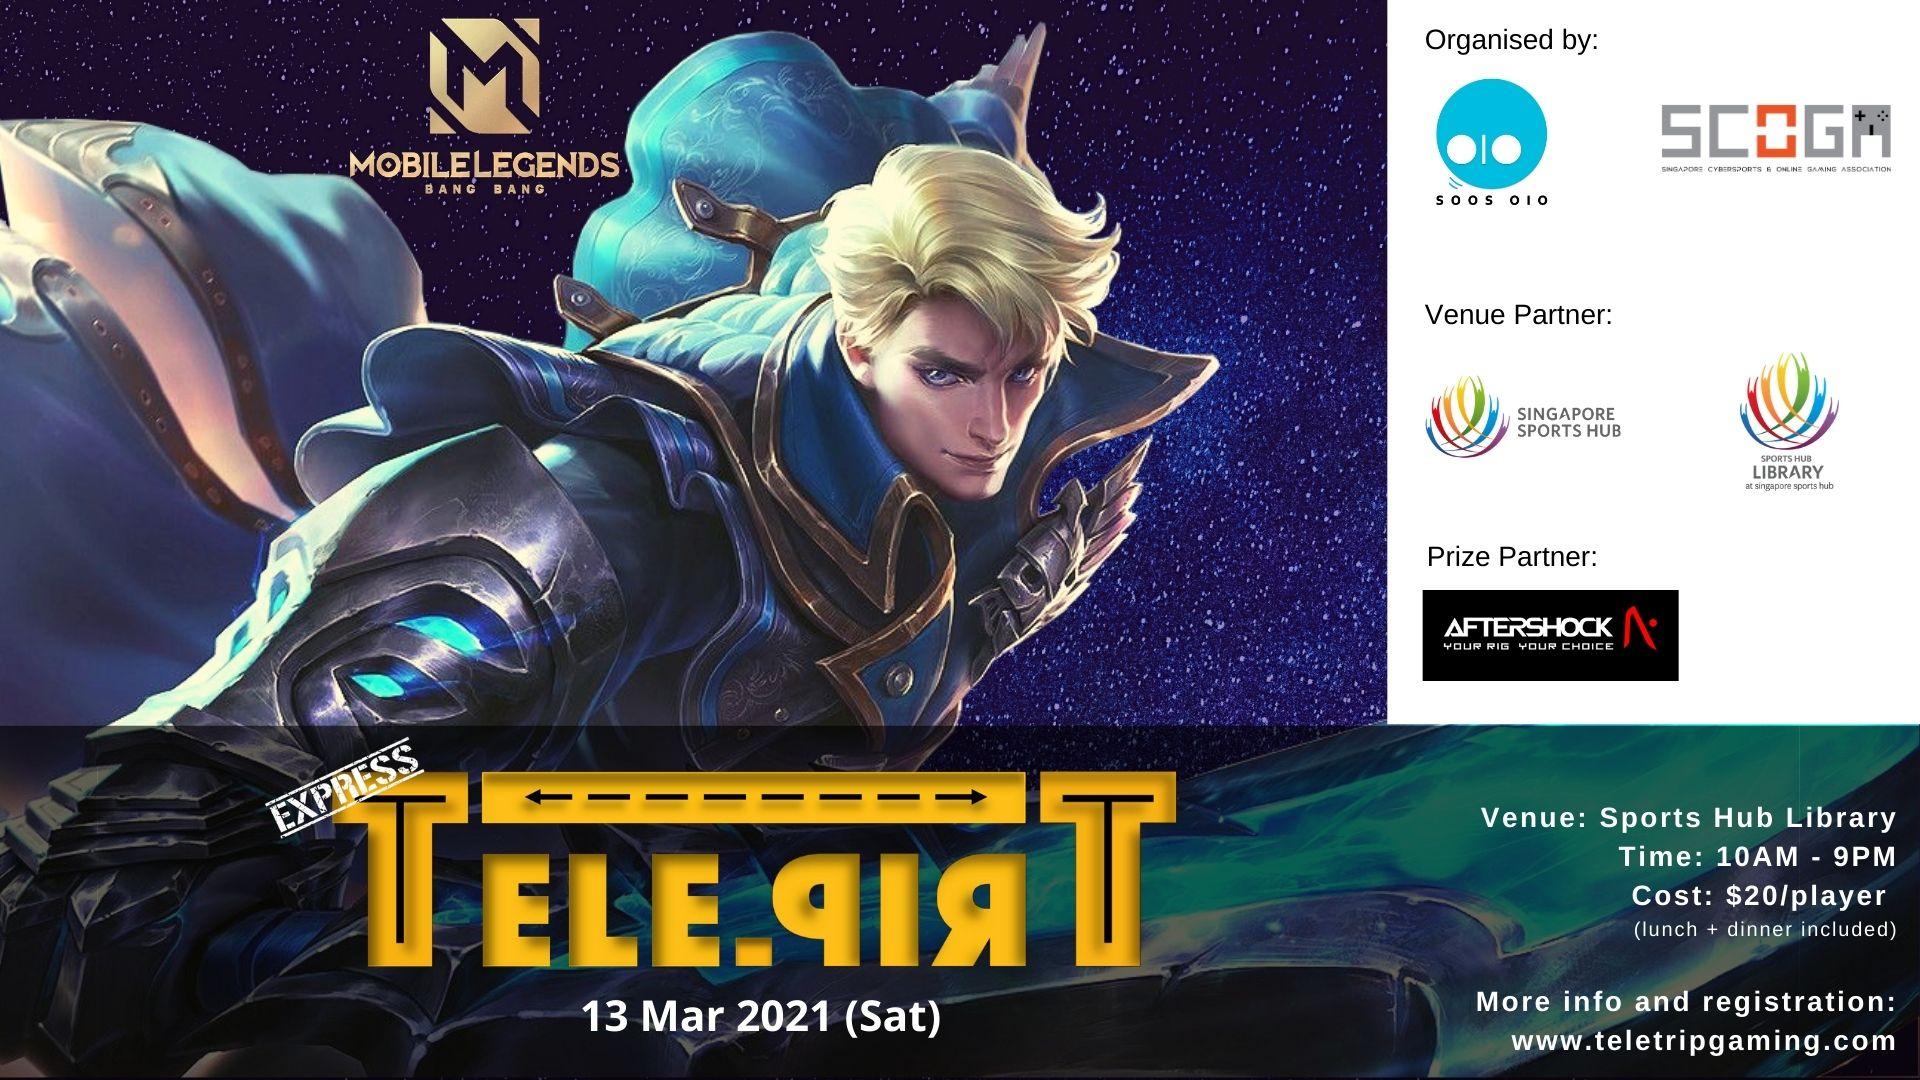 TeleTrip Express Mobile Legends – 13 Mar 2021